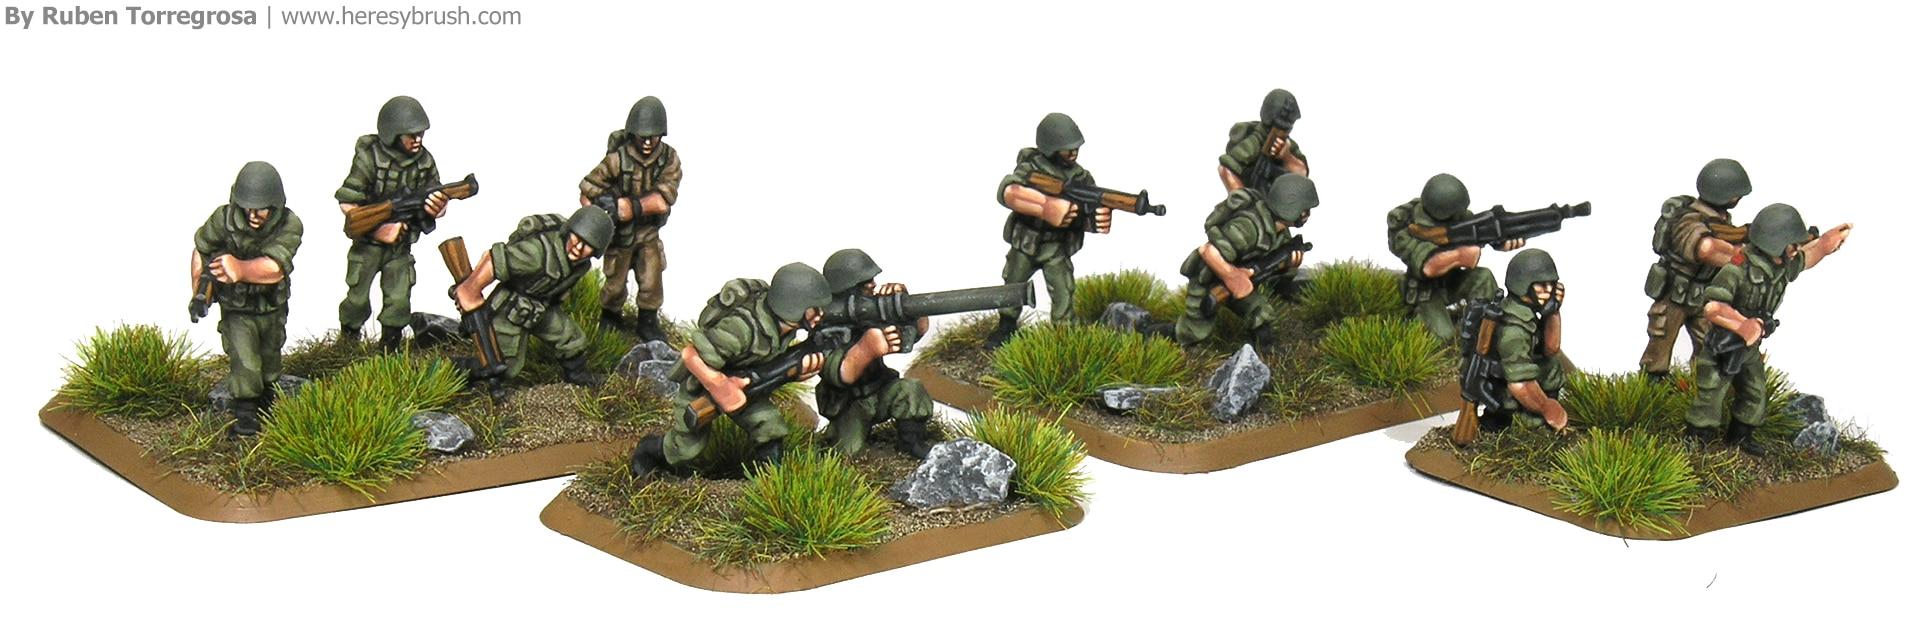 Totentanz Spanish army 1980